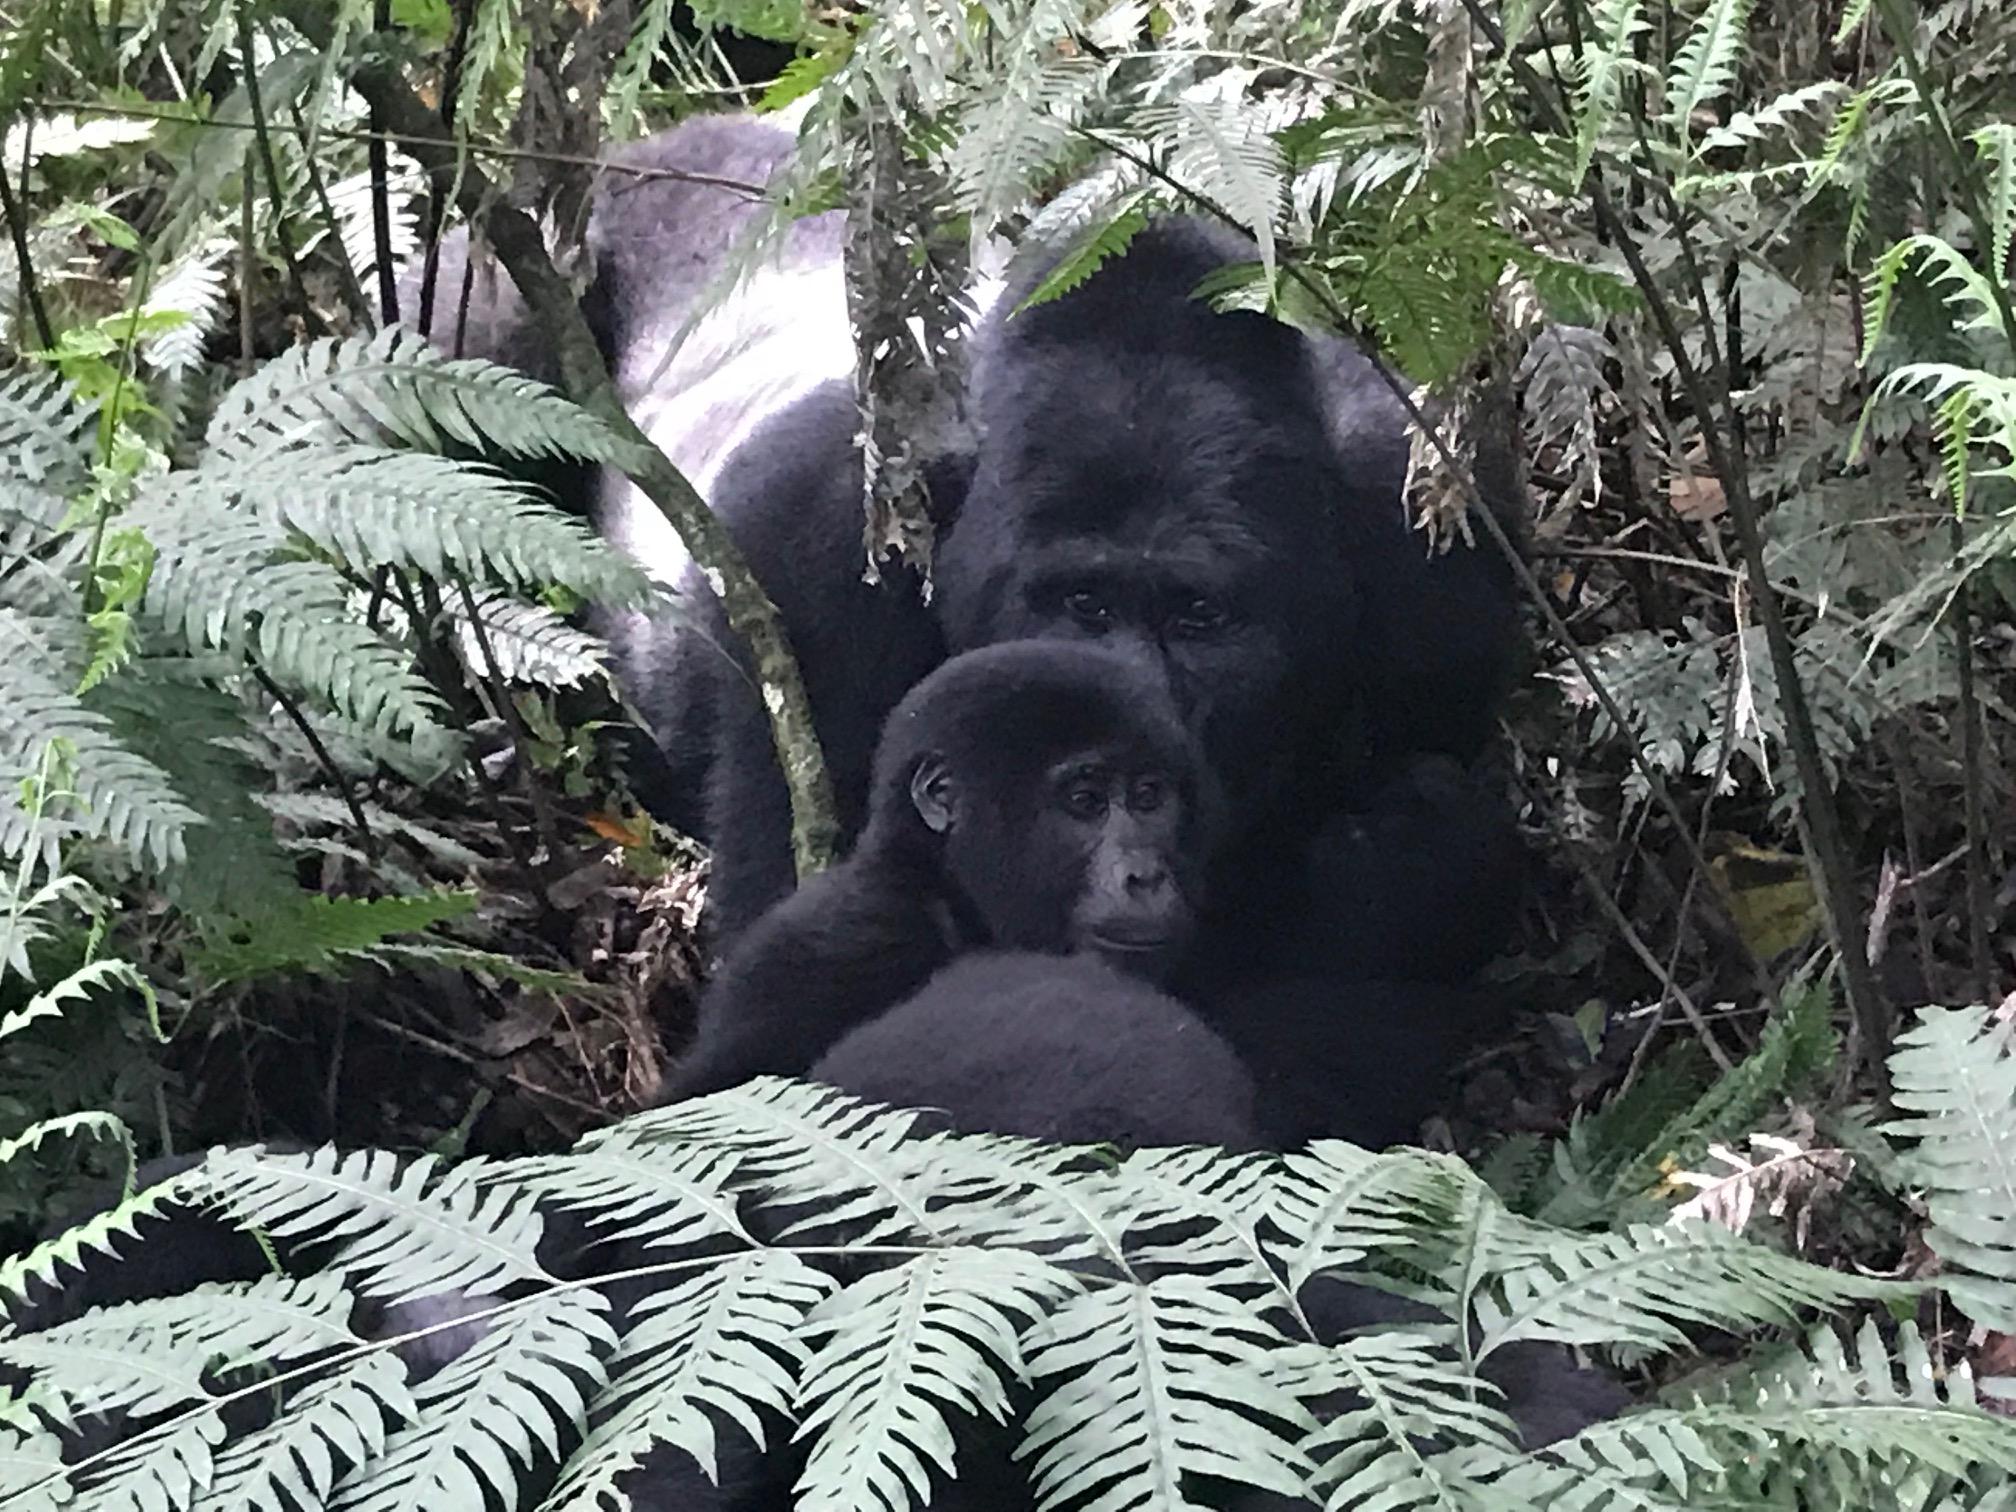 Gorilla Trek Uganda Silverback Gorilla